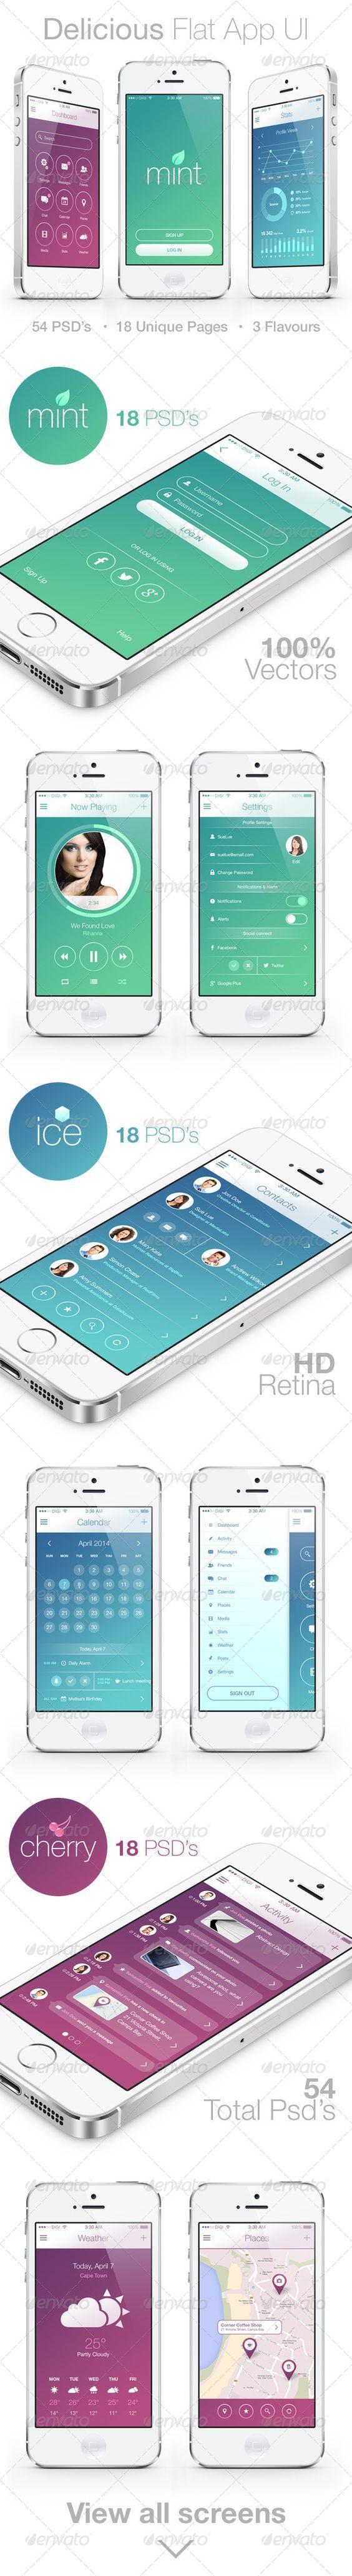 Delicious Flat Mobile App UI app, apple, calendar, chat, contacts, design, flat, iOS7, inbox, ios, iphone, login, map, menu, messenger, mobile, music, profile, psd, retina, settings, stats, ui, user interface, vector, weather, Delicious Flat Mobile App UI: